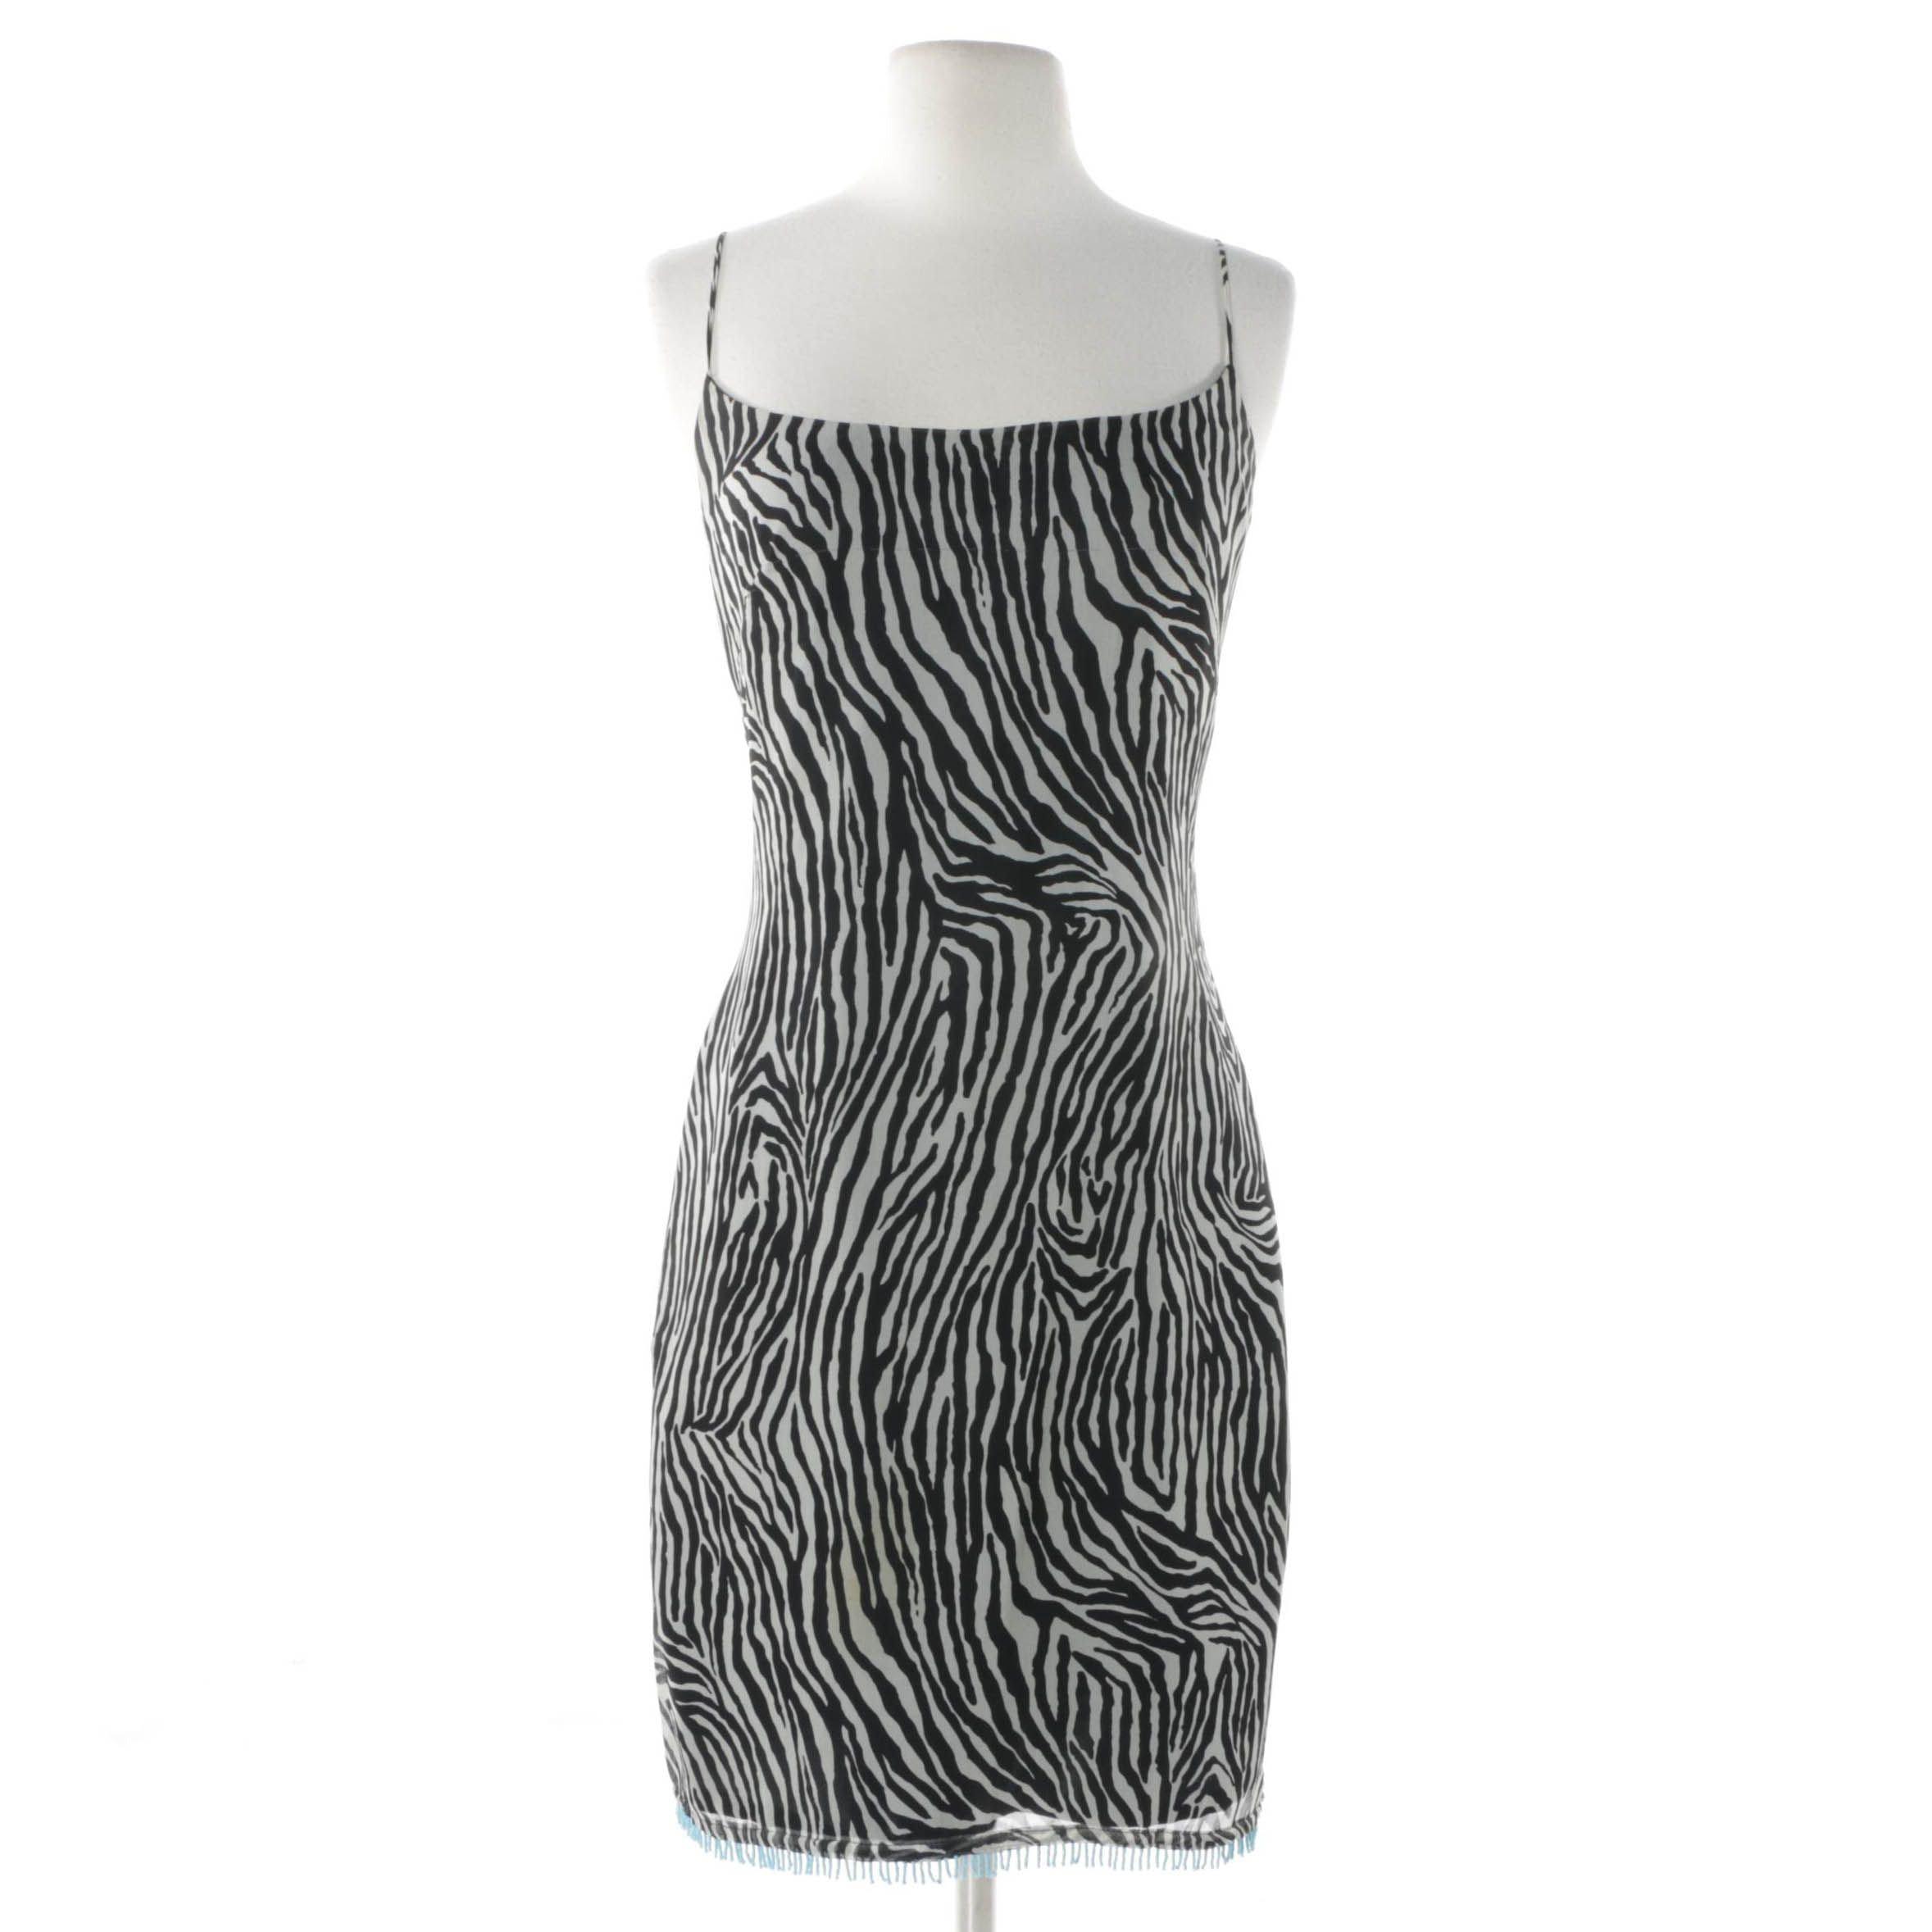 Laundry By Shelli Segal Zebra Print Sleeveless Cocktail Dress with Beaded Hem